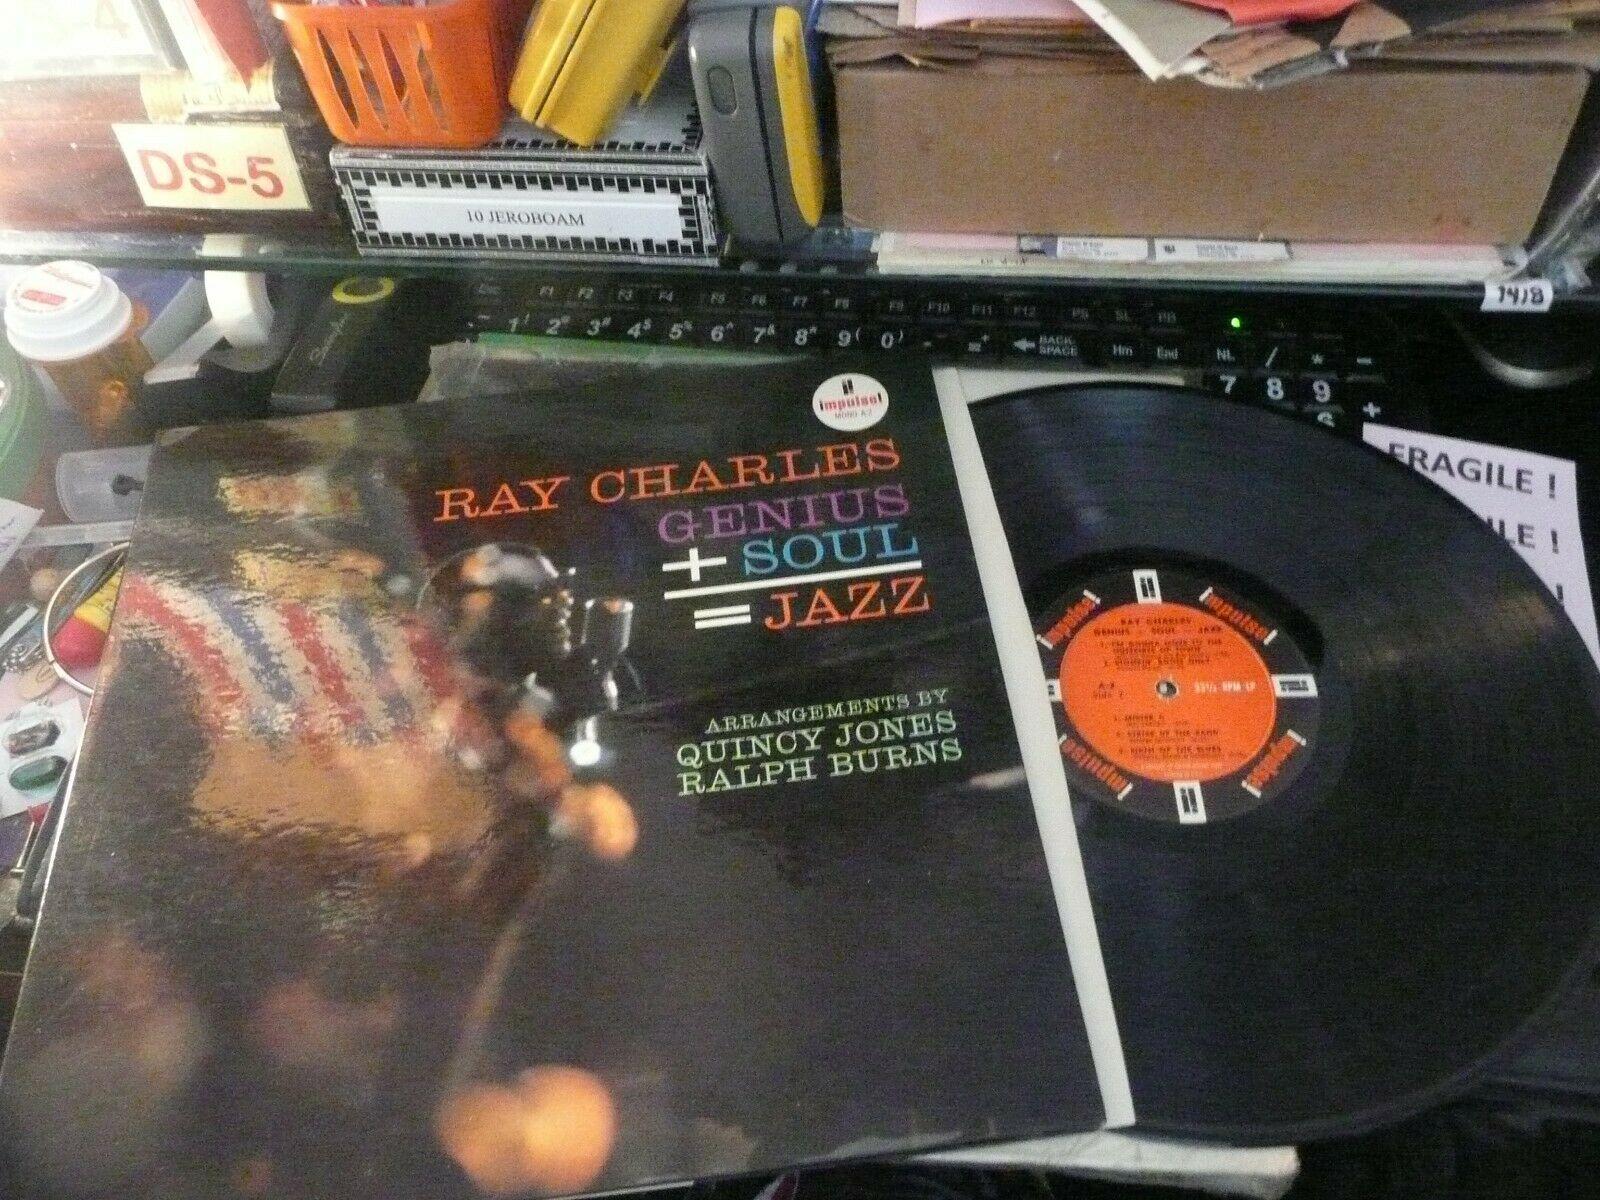 record LP R&B Ray Charles Mono   Genius + Soul =Jazz  on Impulse NM- top Copy